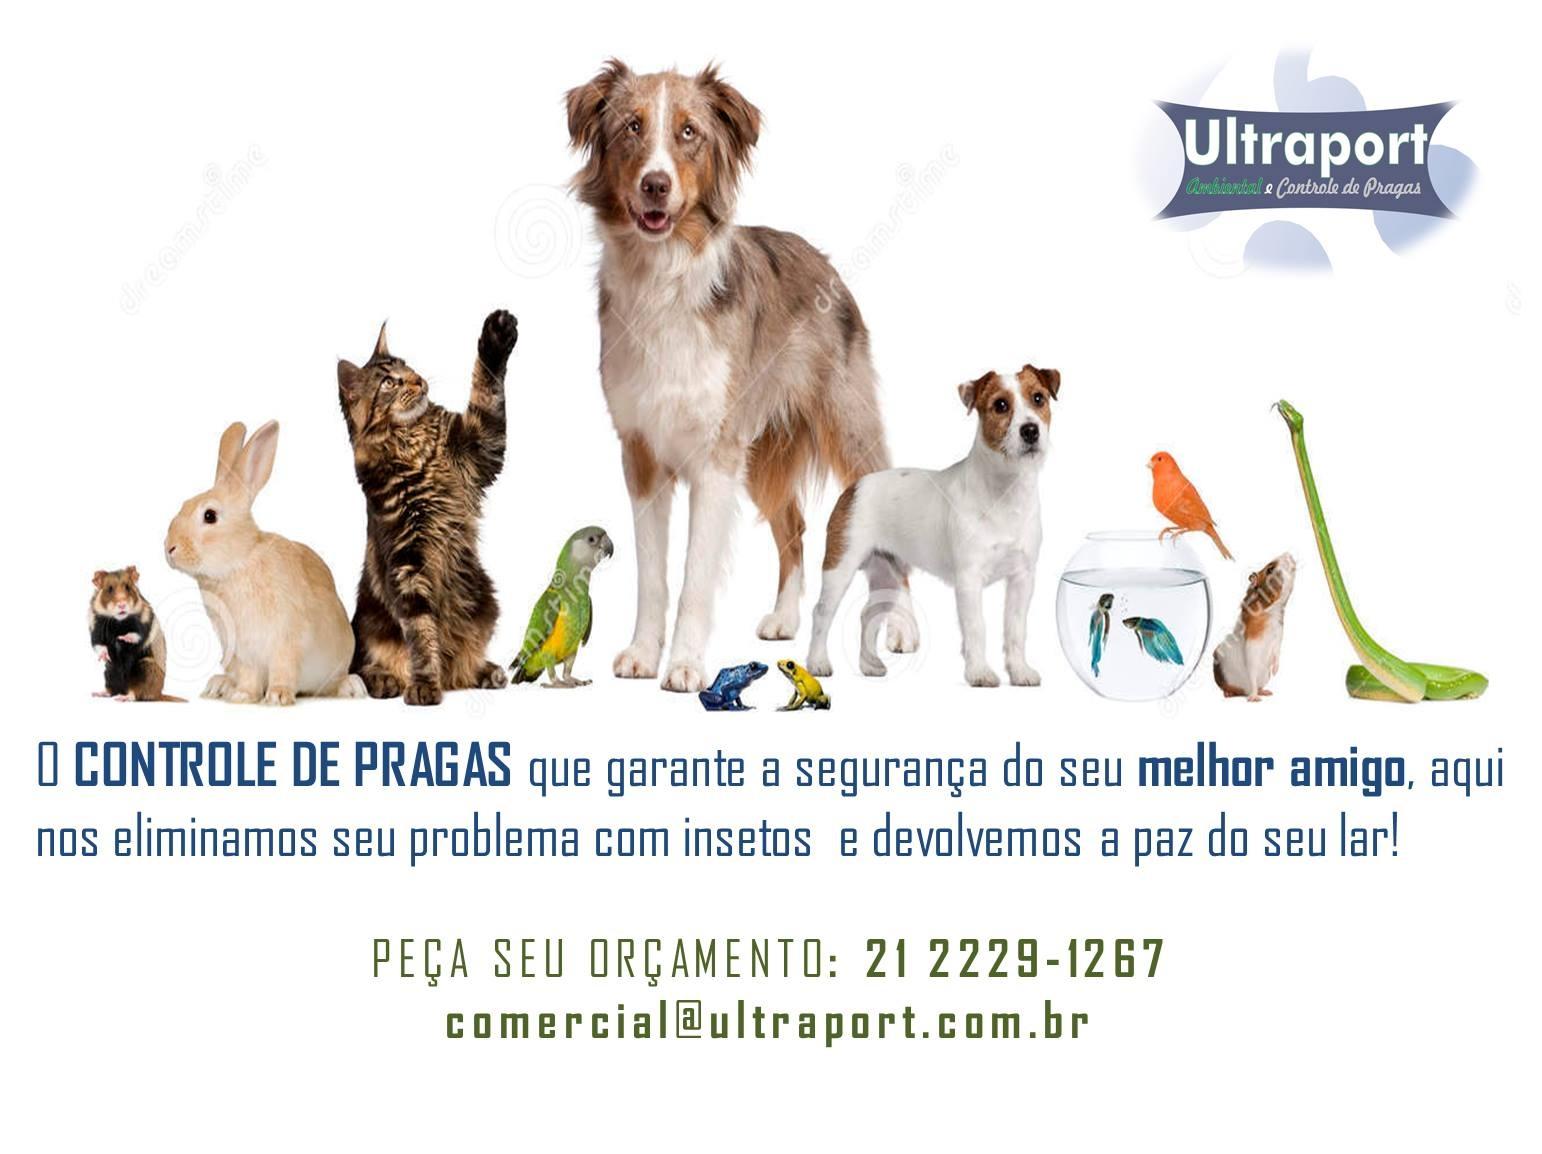 CONTROLE DE PRAGAS EM PETROPOLIS - ULTRAPORT - RJ